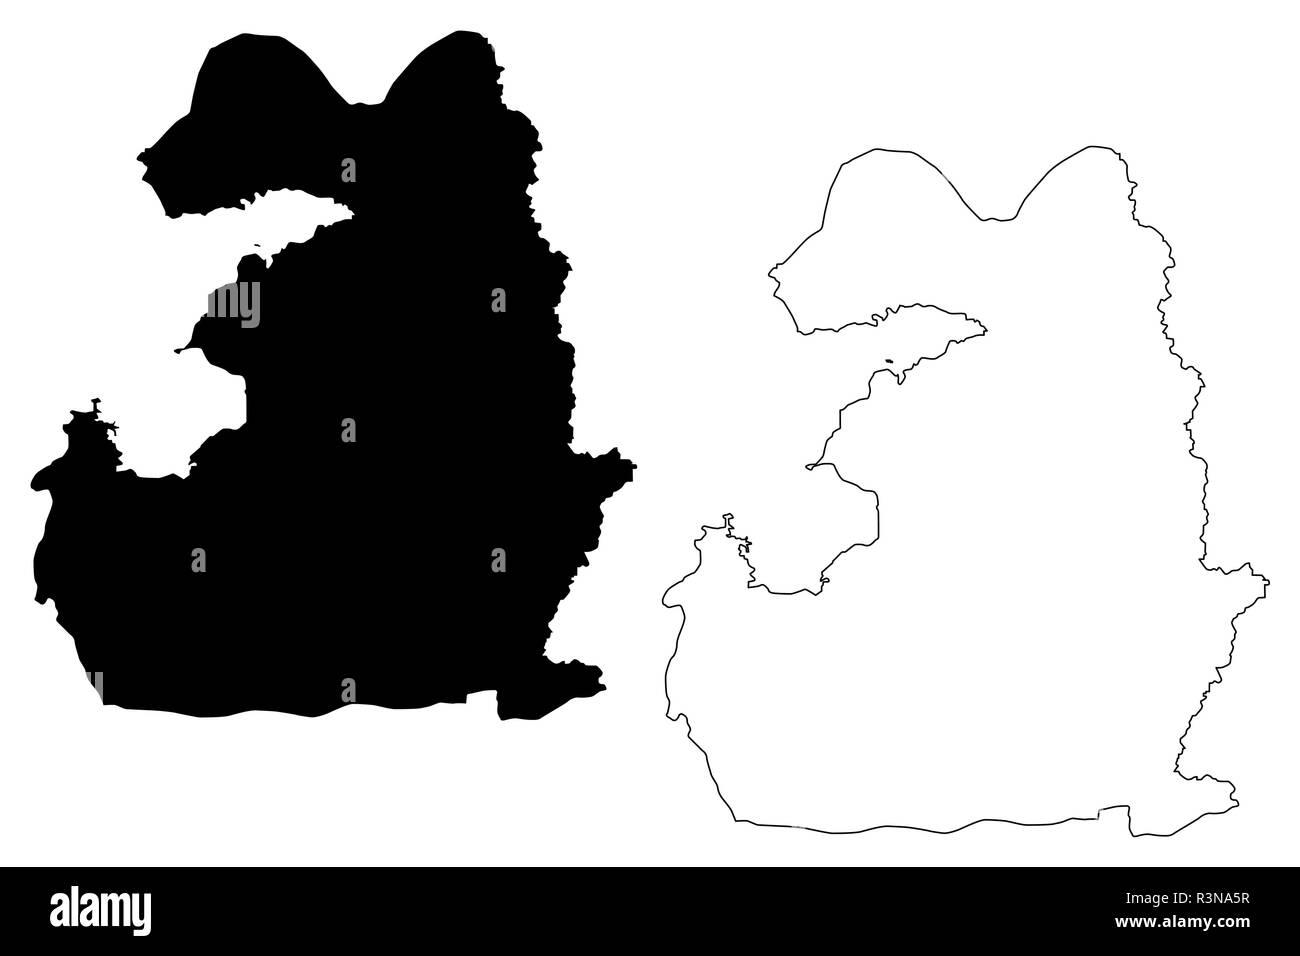 Van (Provinces of the Republic of Turkey) map vector illustration, scribble sketch Van ili map - Stock Image